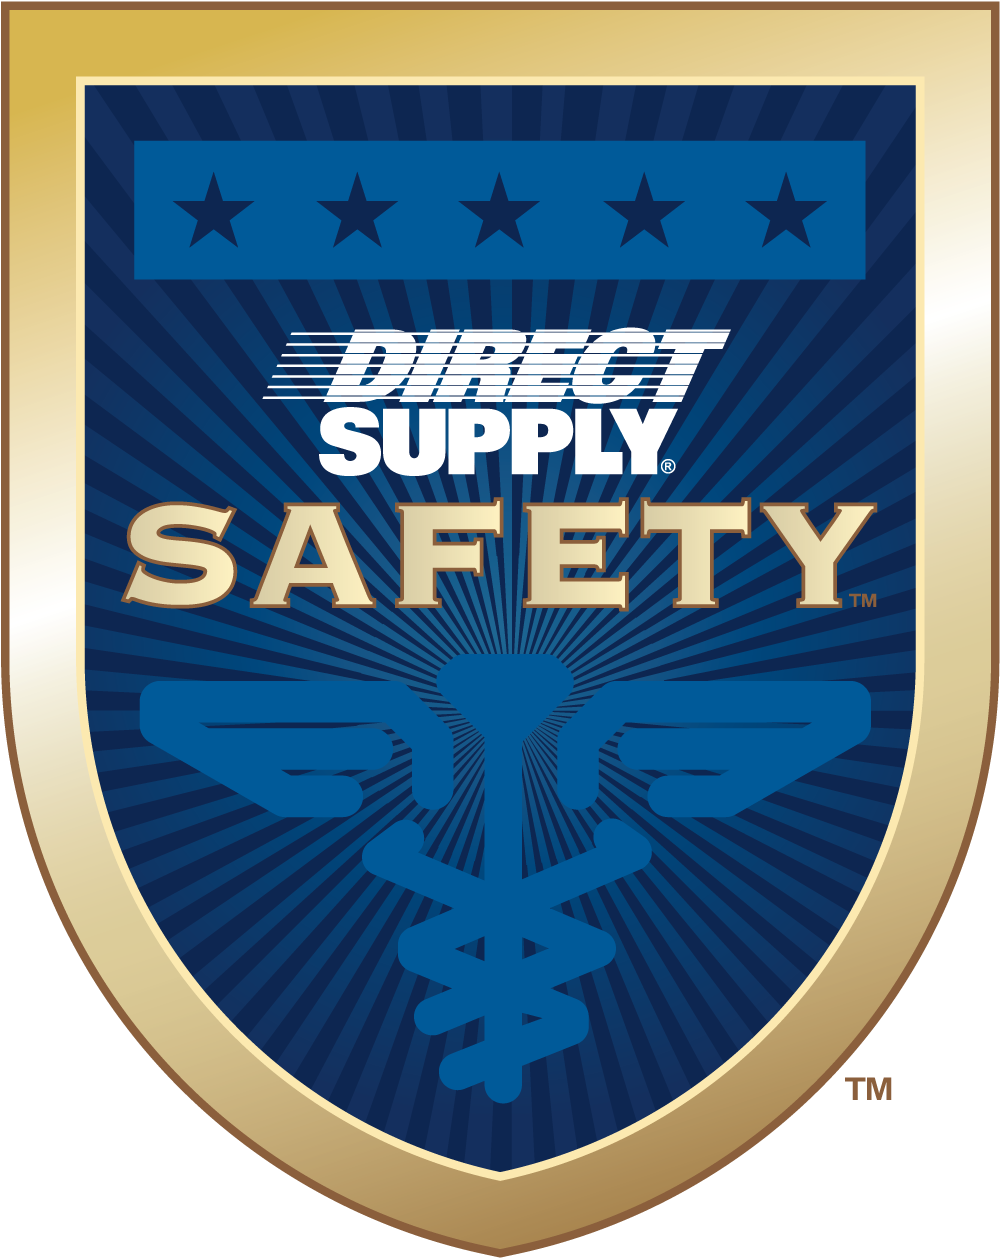 ds-safety-white-logo-3